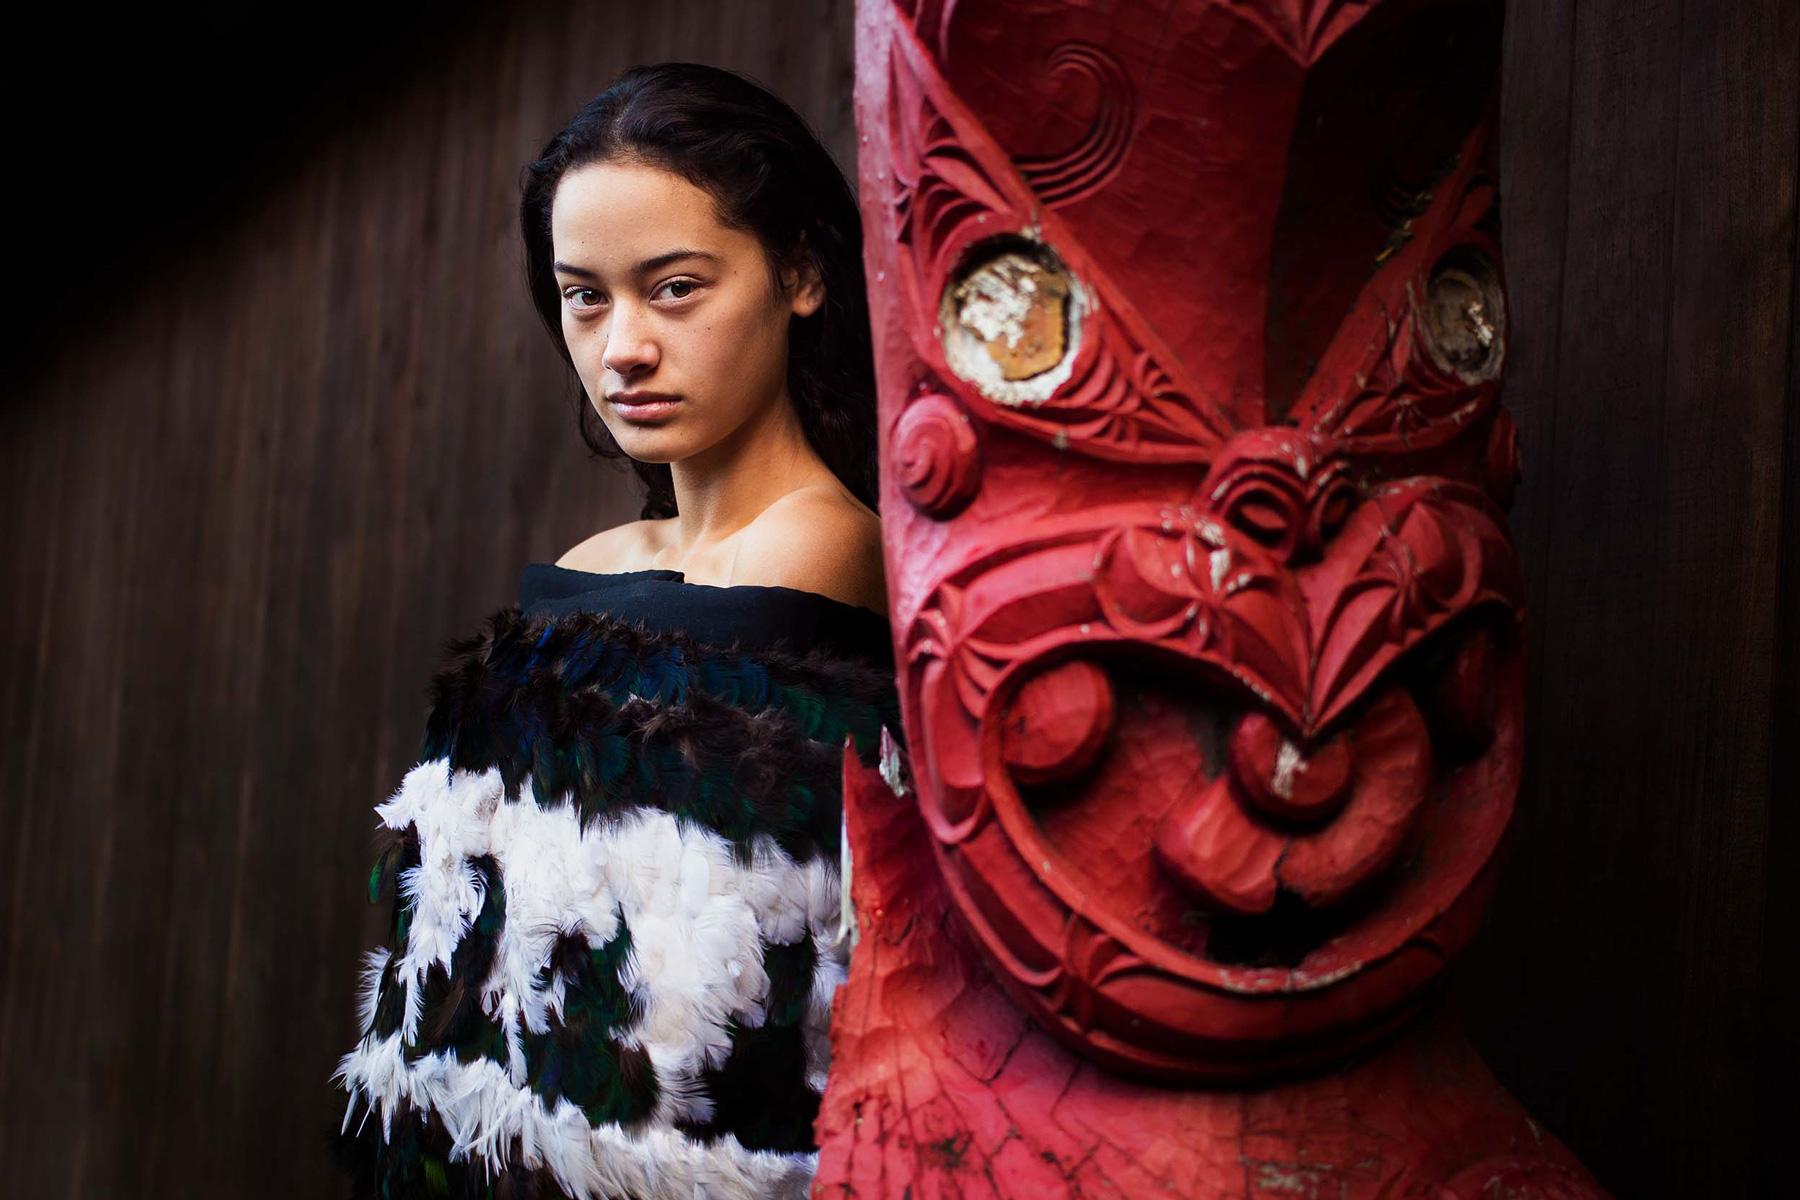 Mihaela-Noroc-Atlas-of-Beauty-Maori-New-Zealand